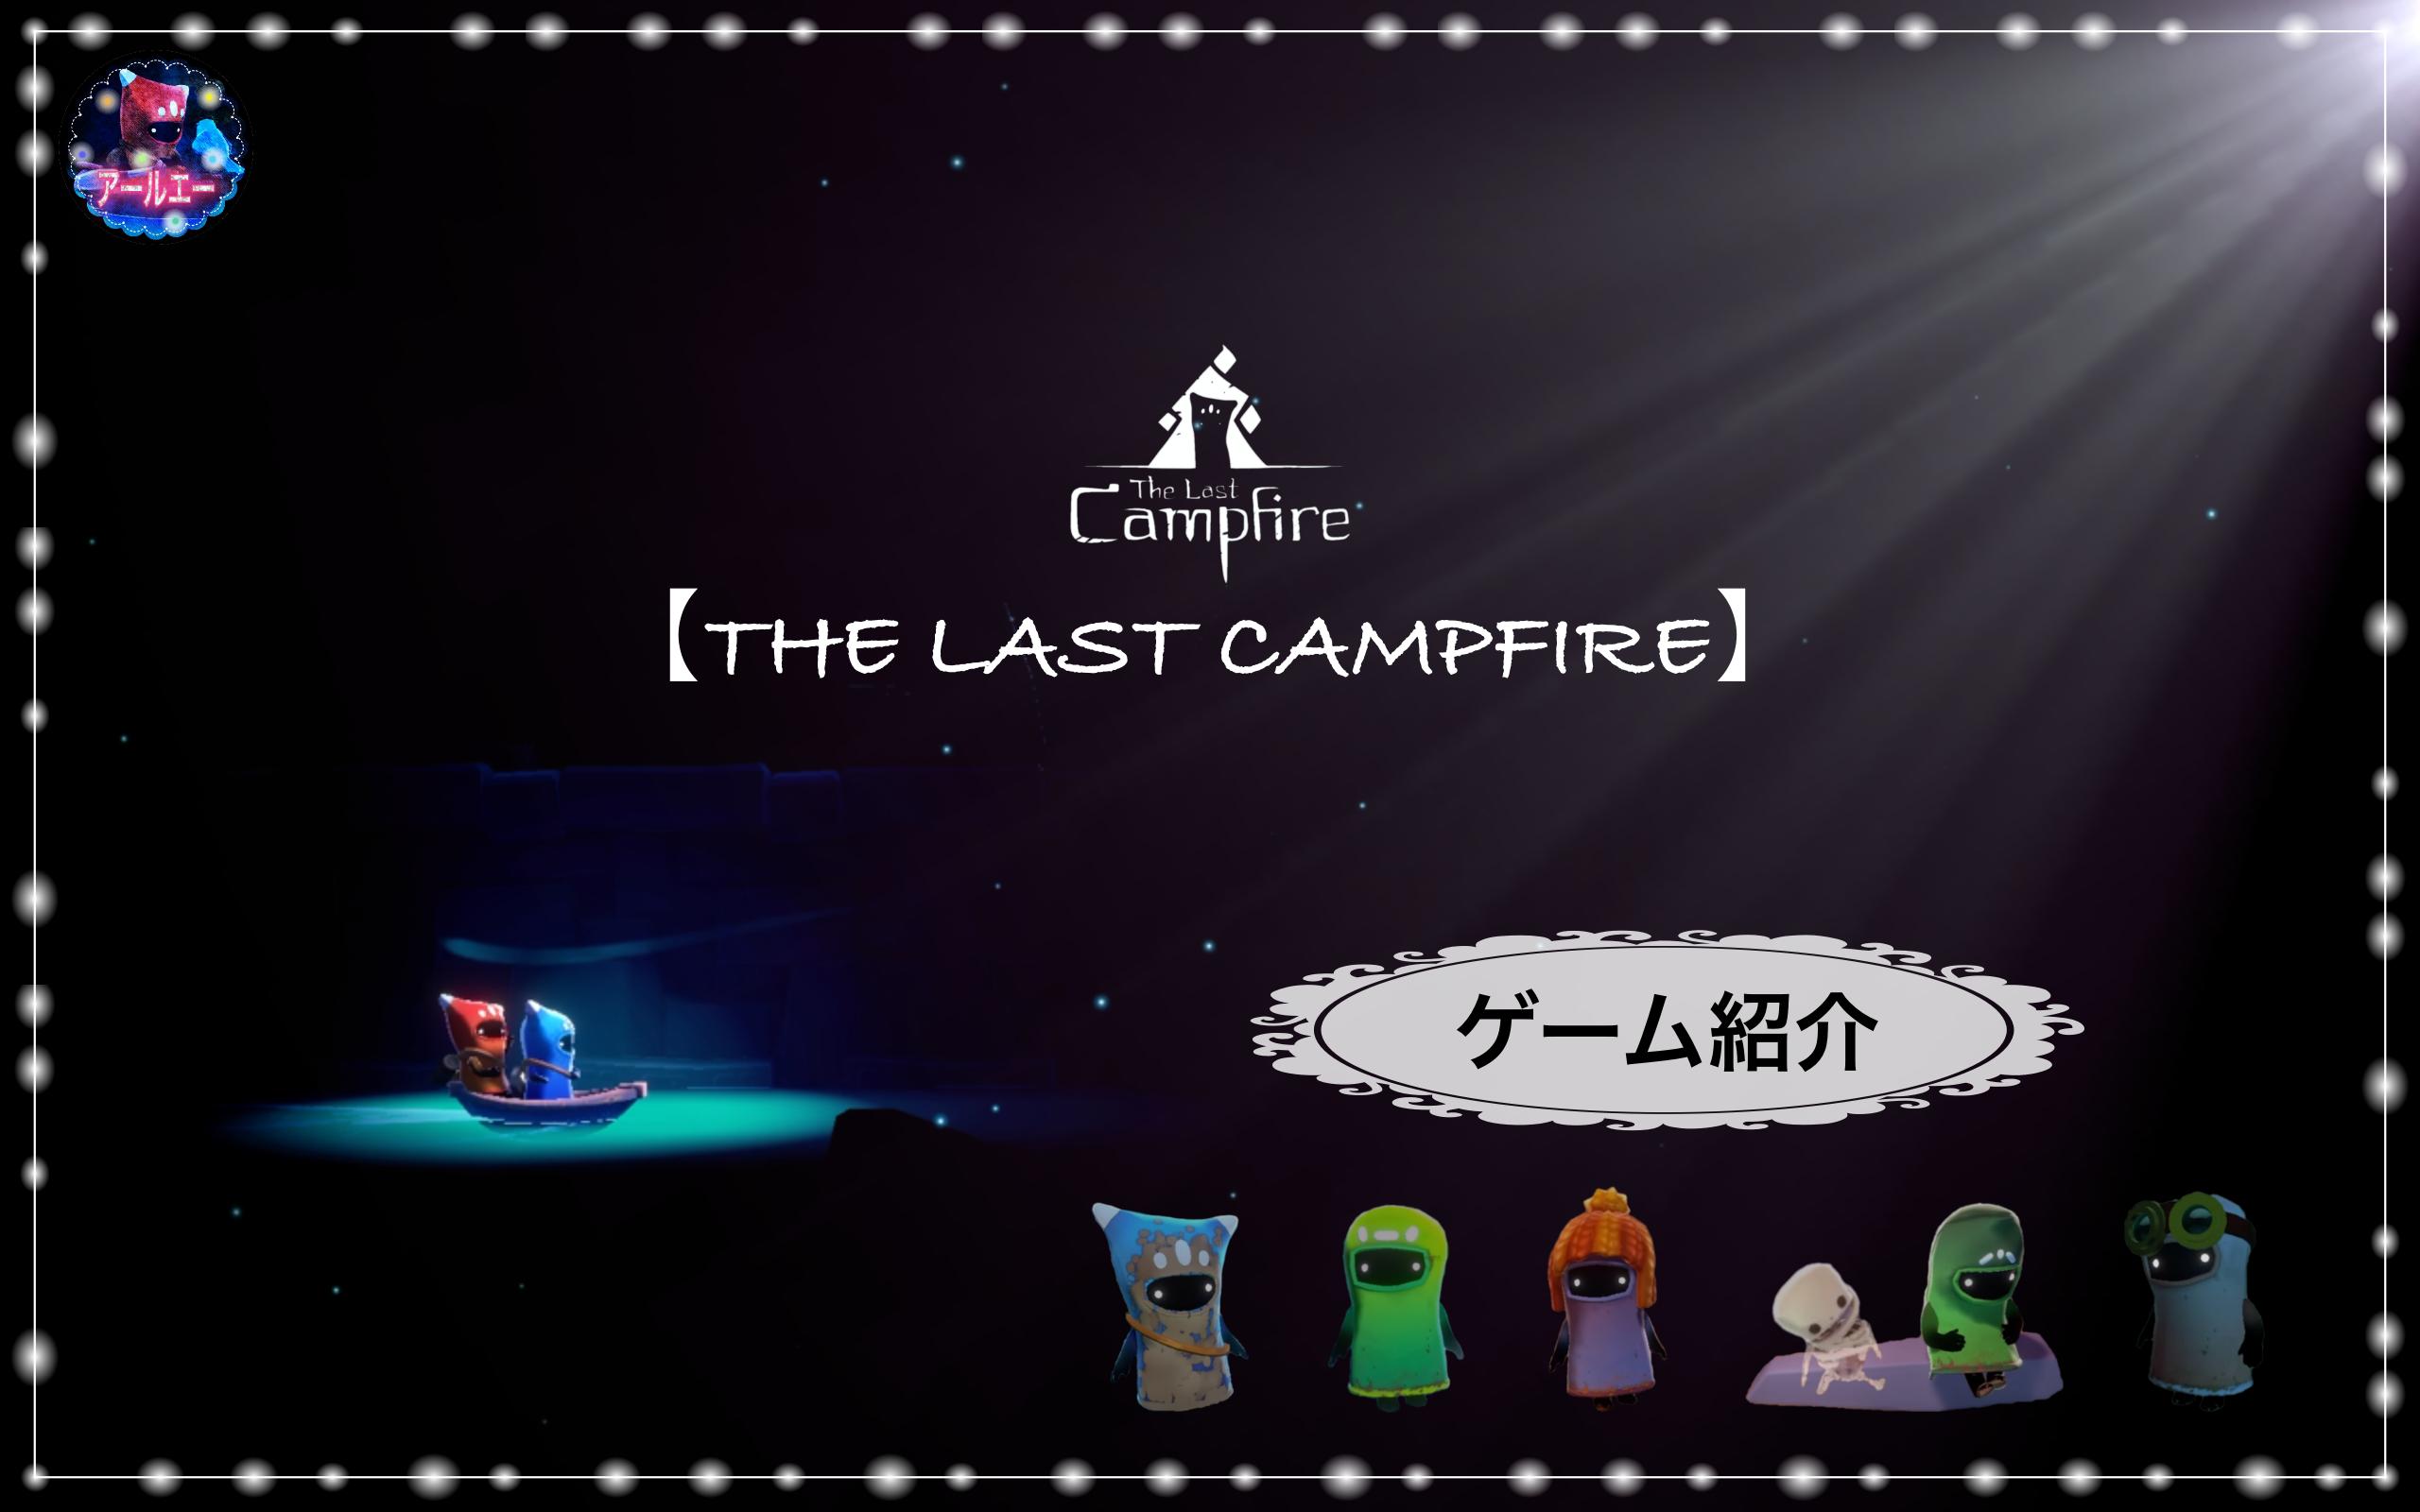 The Last Campfire_紹介トップ画